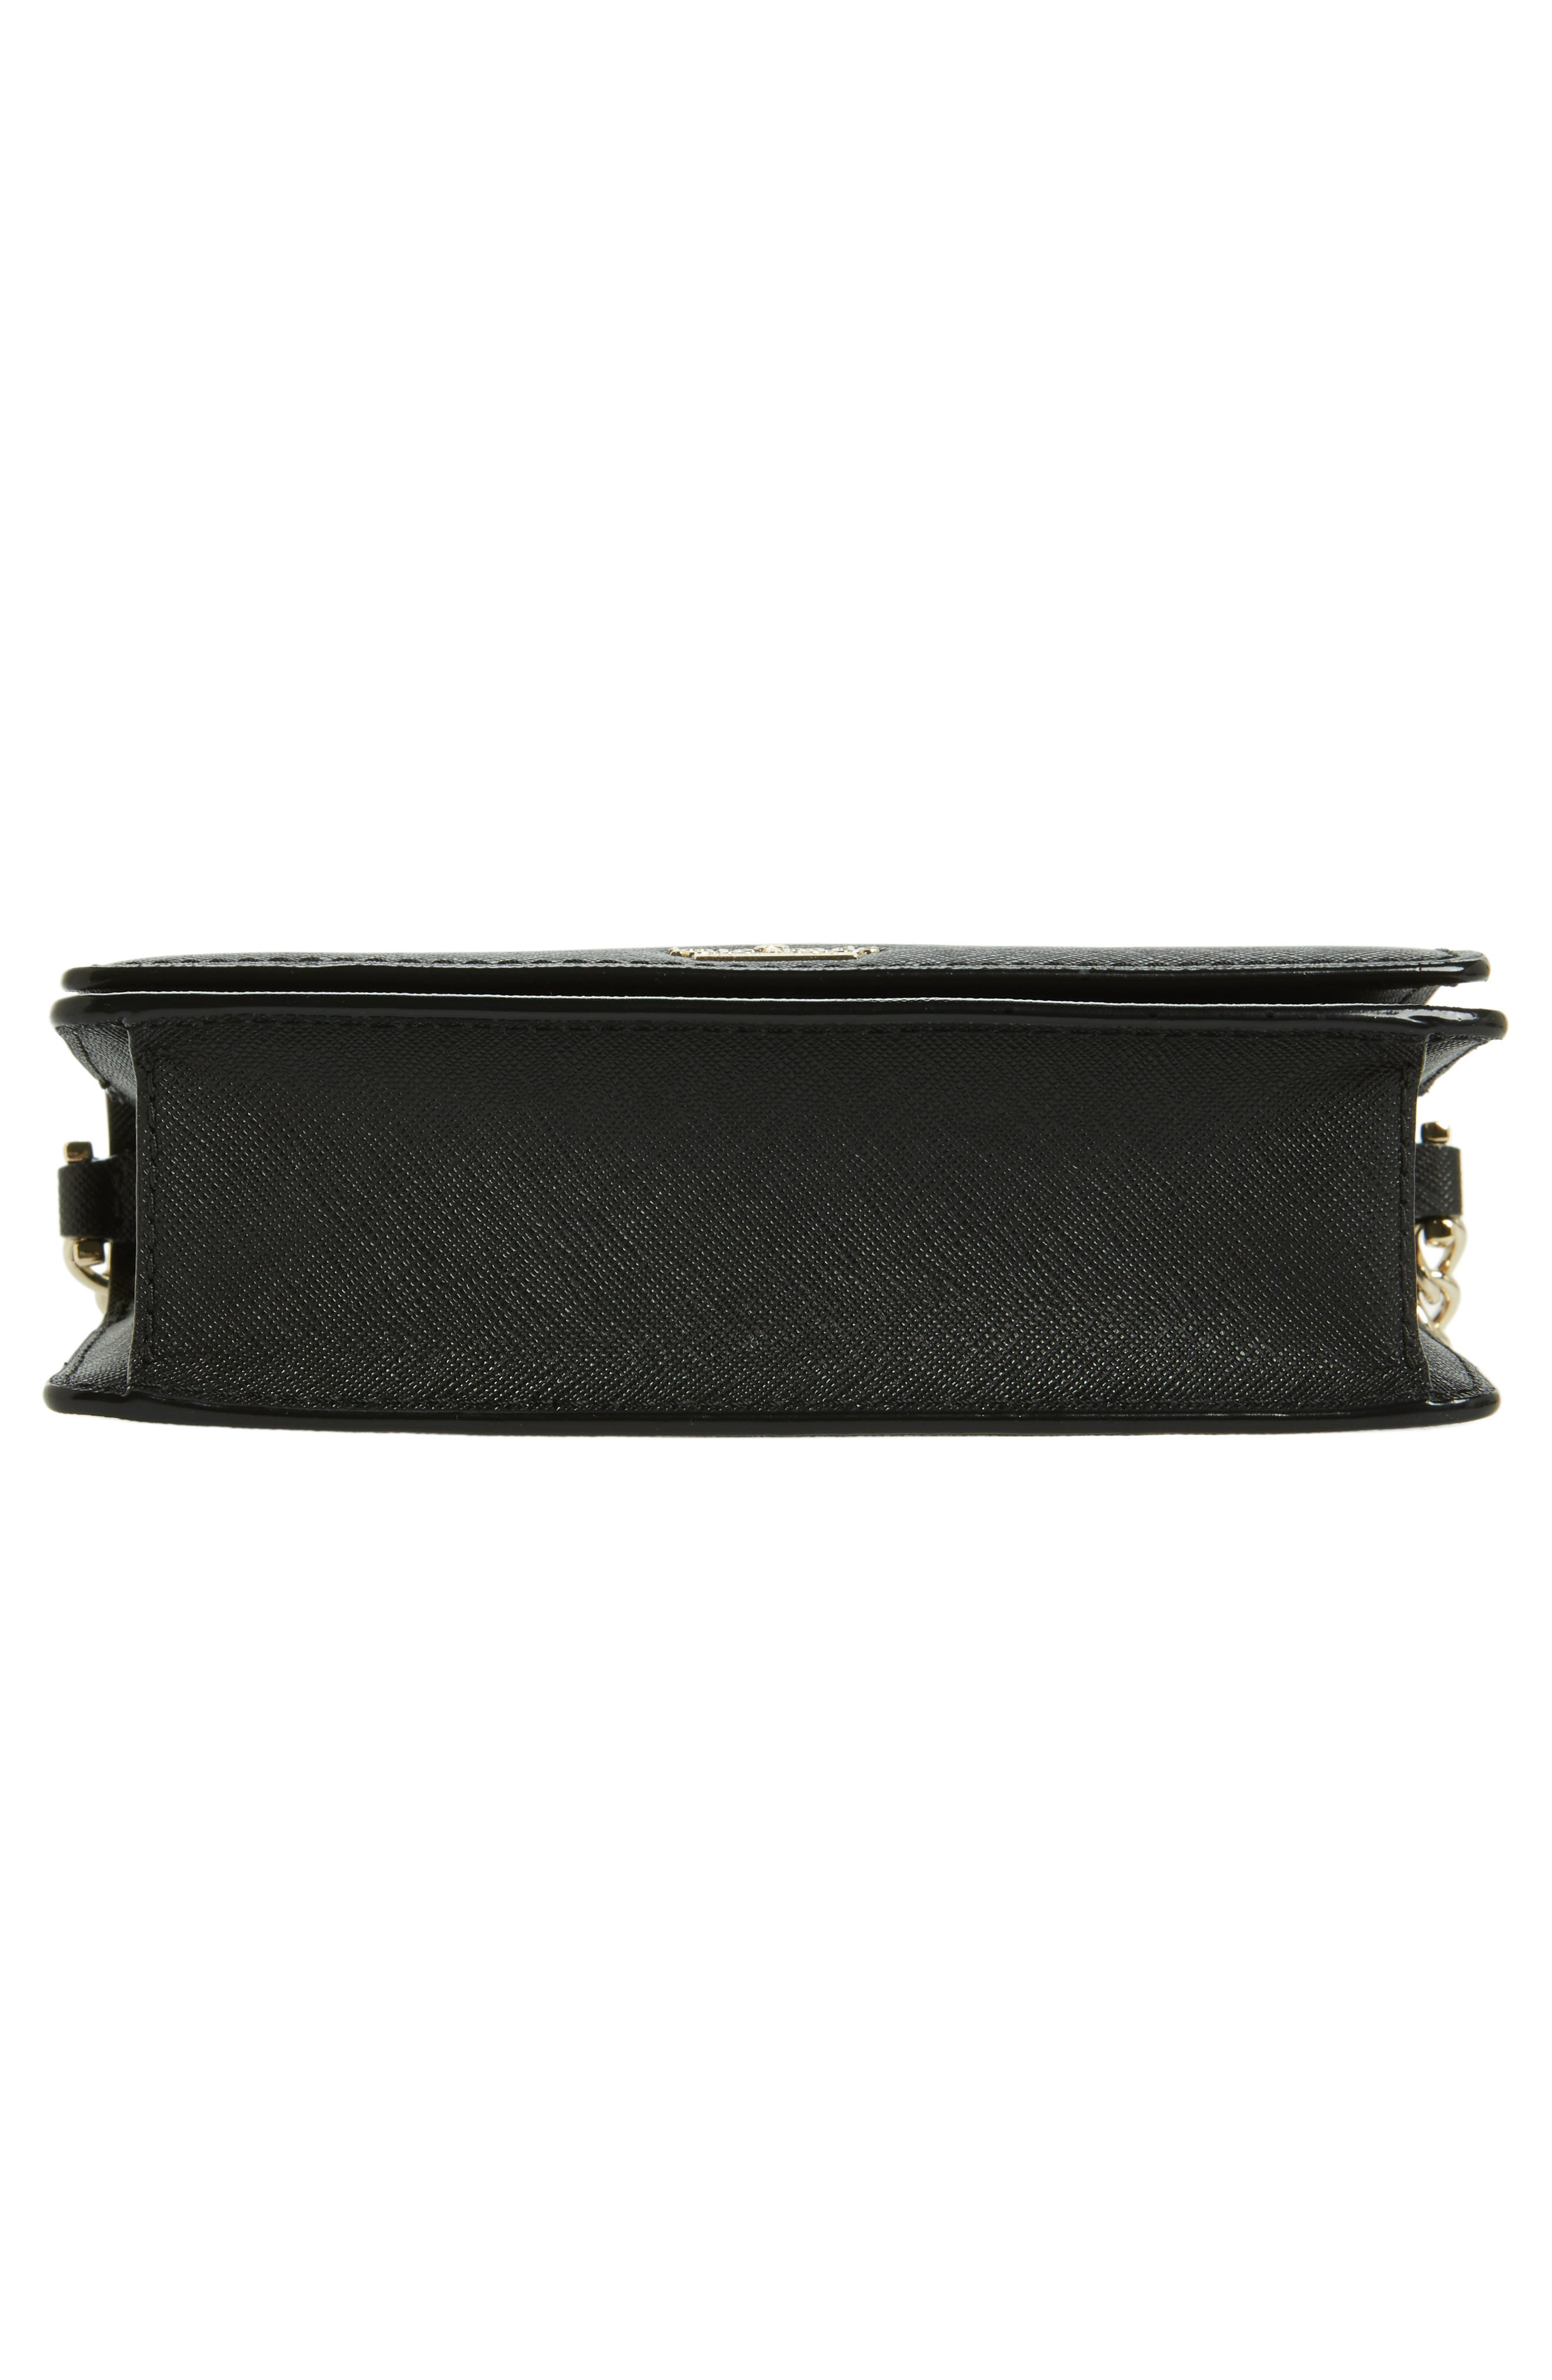 cameron street - shreya leather crossbody bag,                             Alternate thumbnail 6, color,                             001